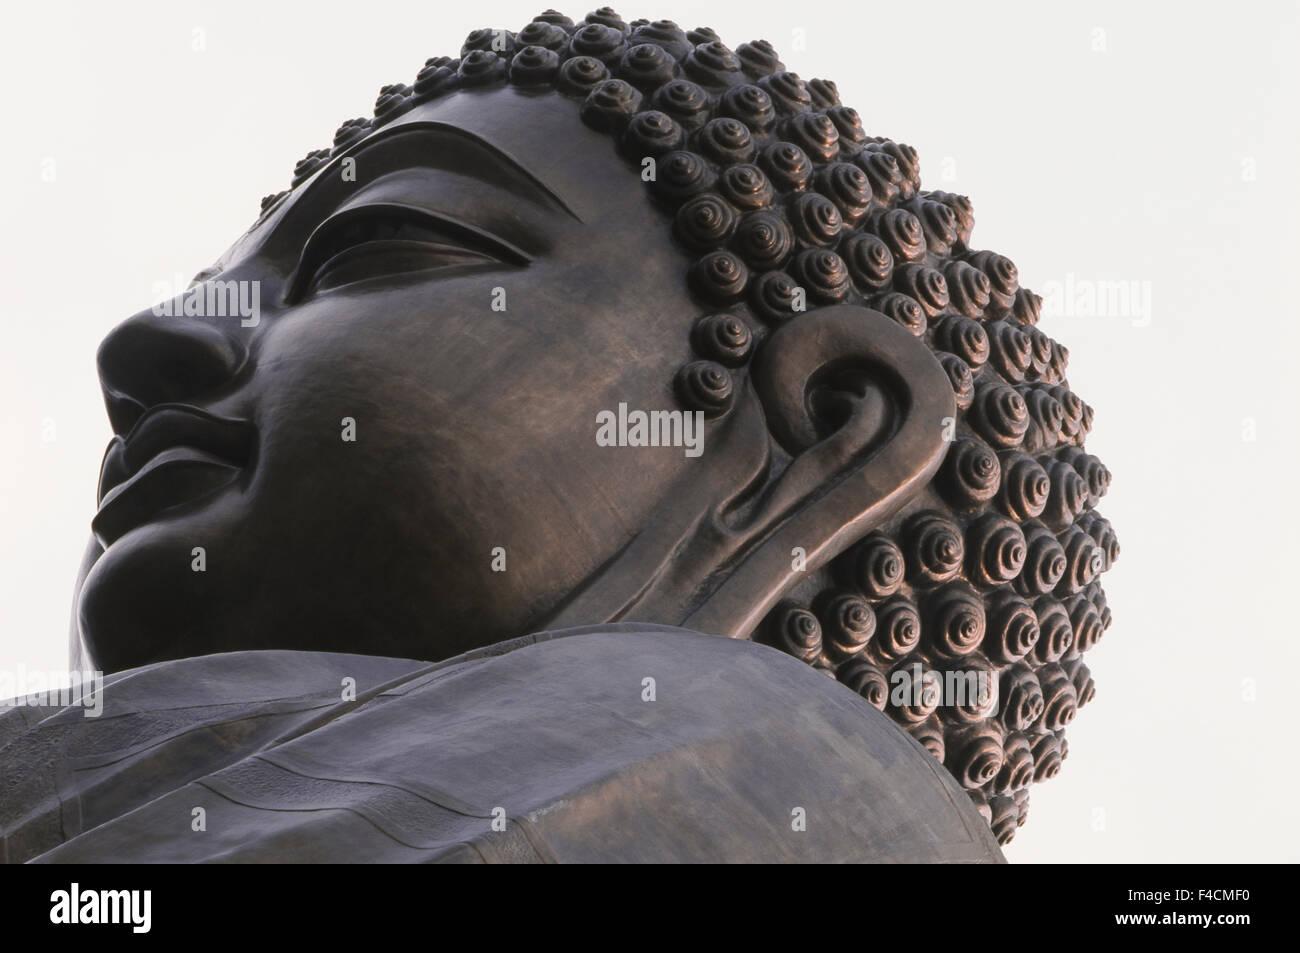 Hong Kong, Lantau Island, Po Lin Monastery, Buddha-Lantau Island, Close-Up, Statue of largest Buddha. (Large format - Stock Image